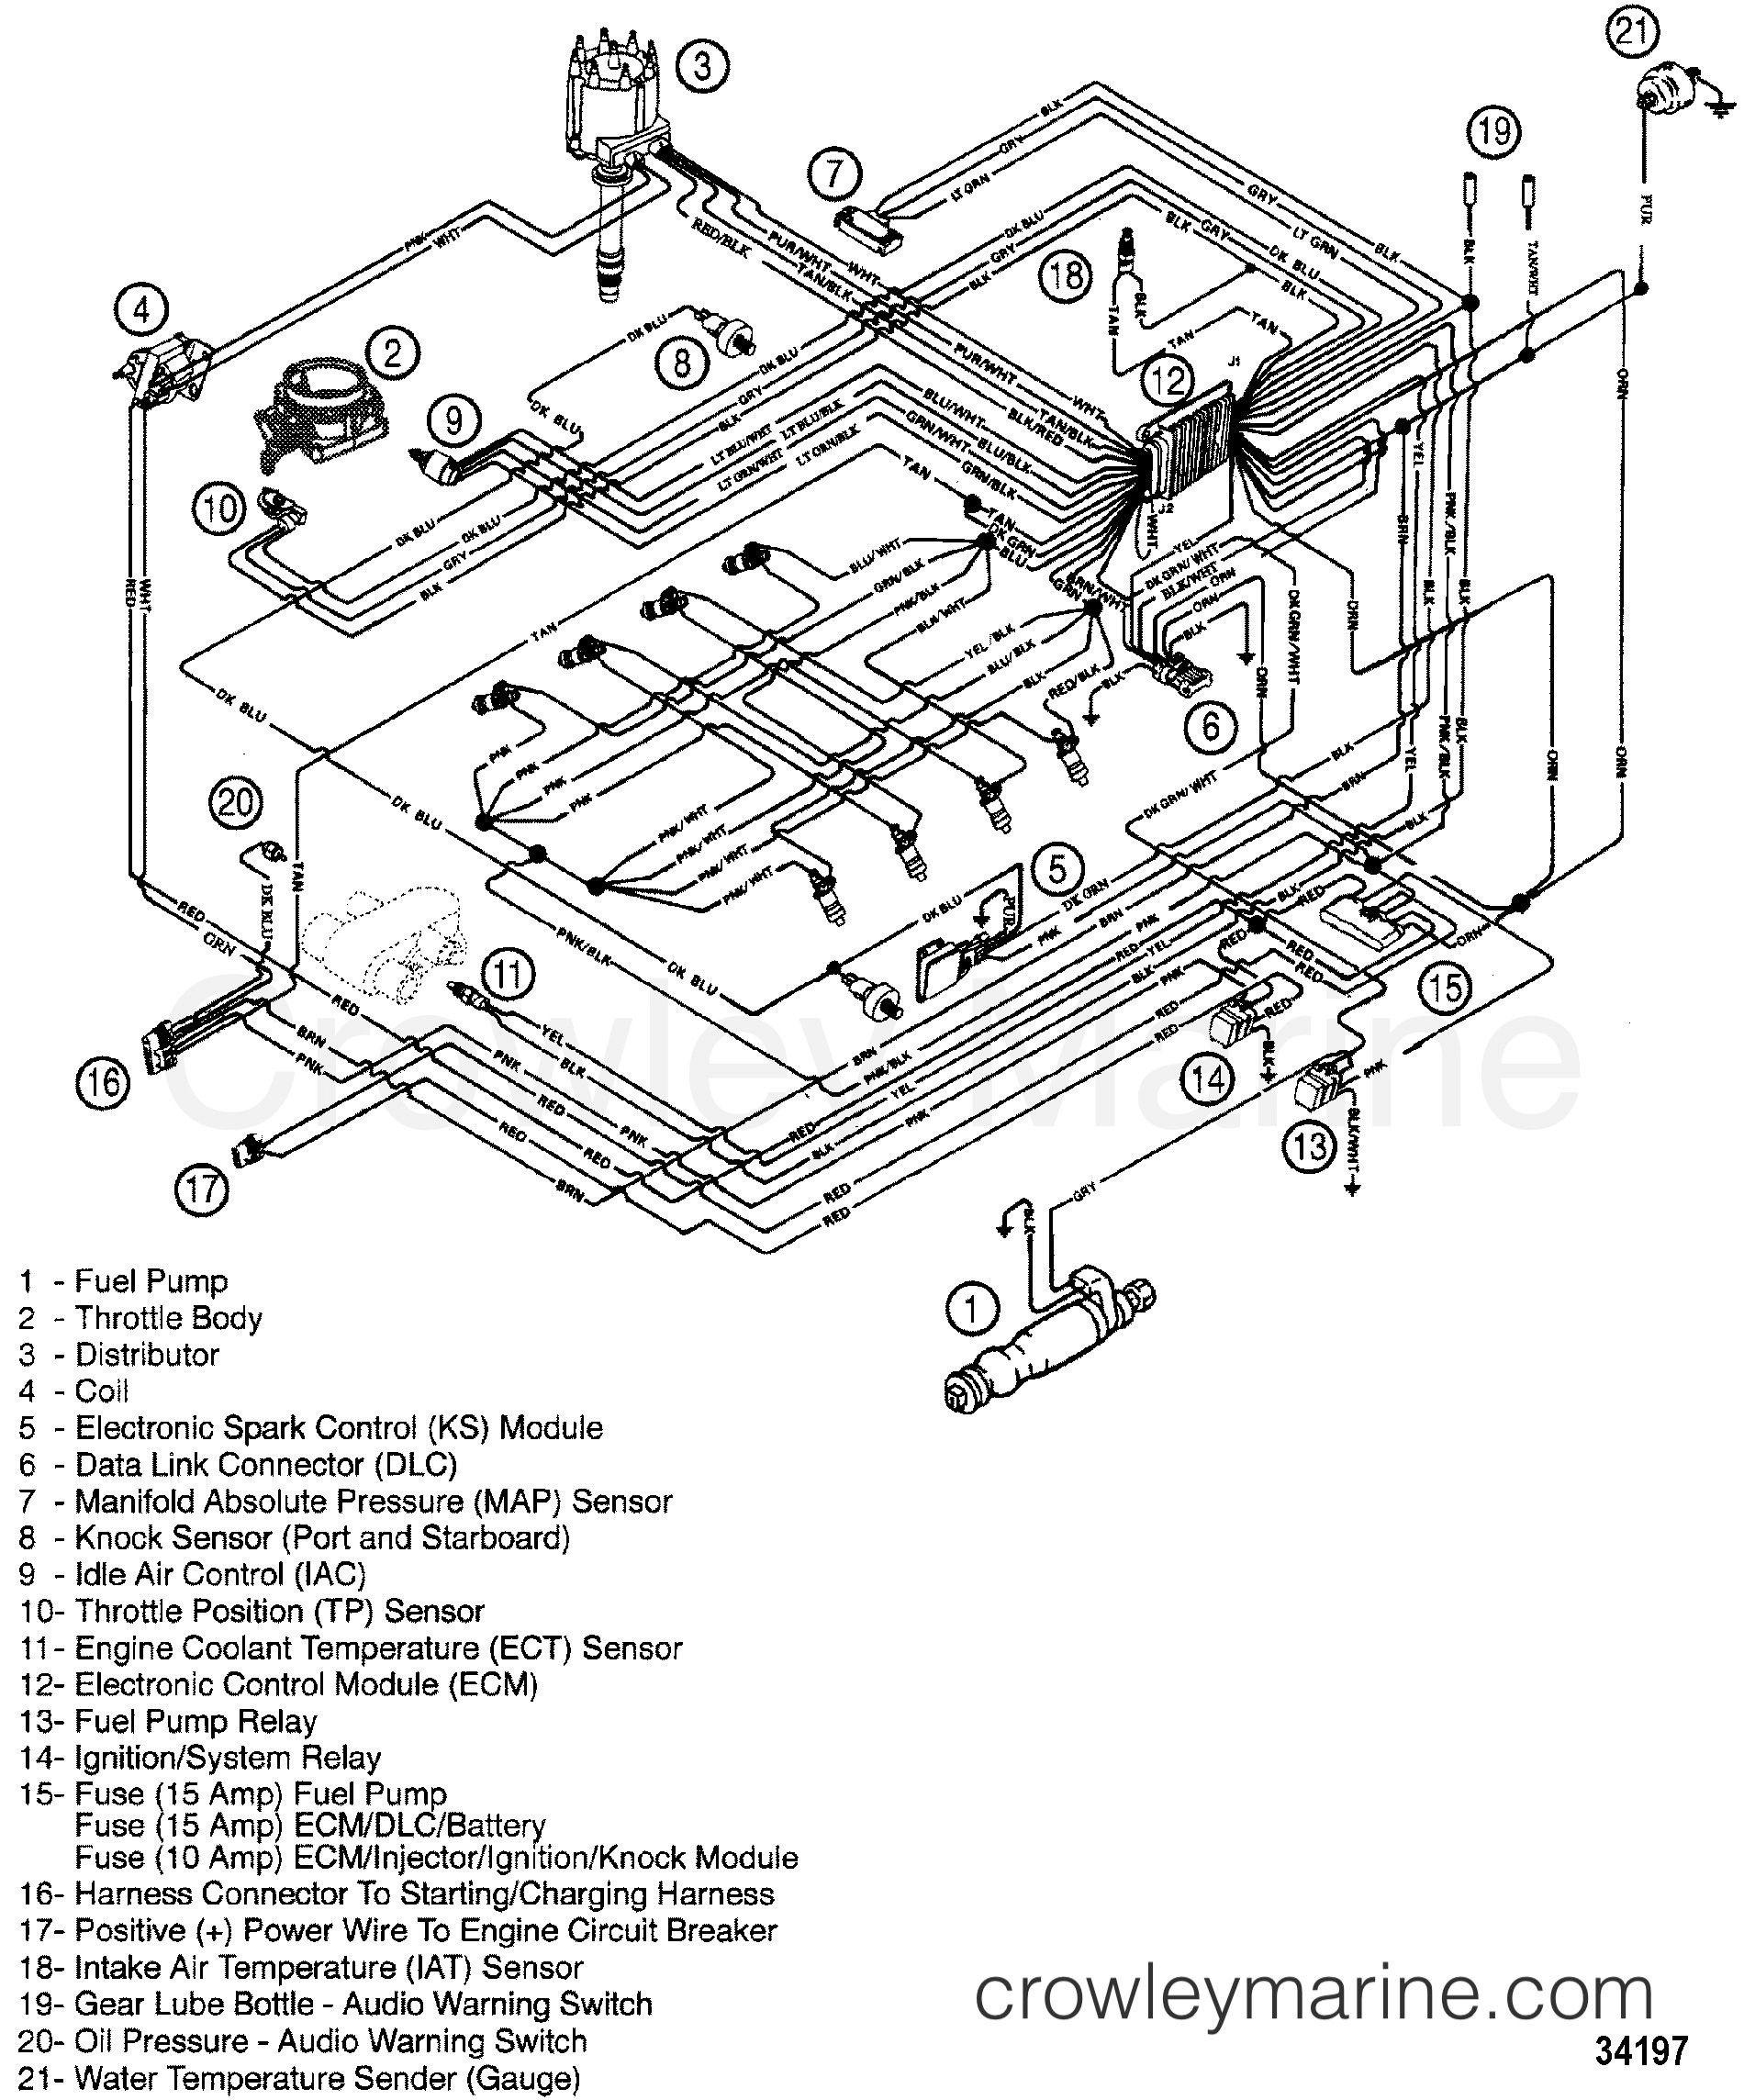 40 40 Mercruiser Engine Wiring Diagram   social publishe Use Wiring ...